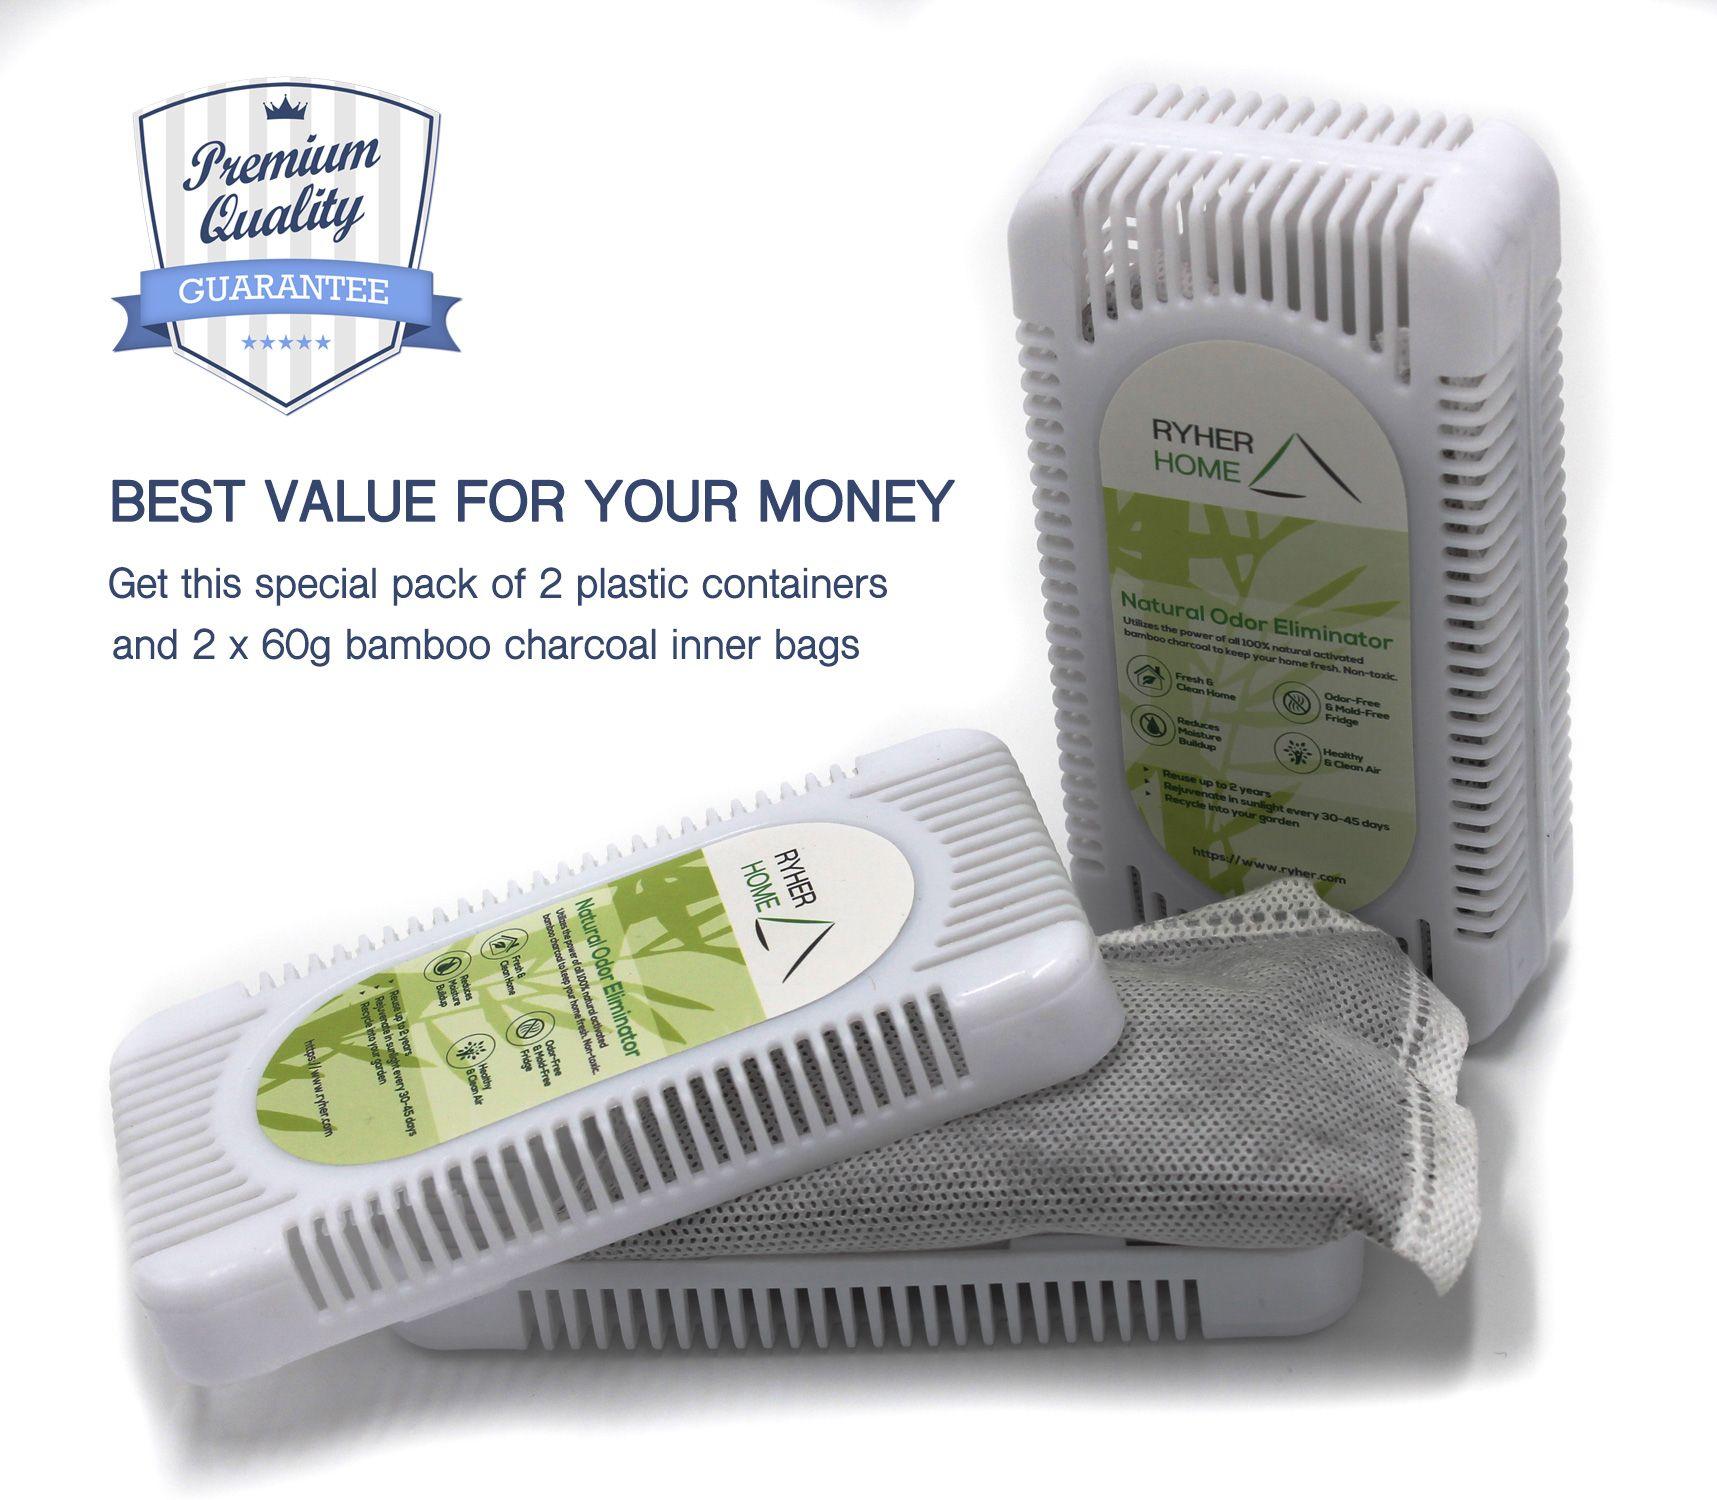 Ryher Charcoal Refrigerator Box